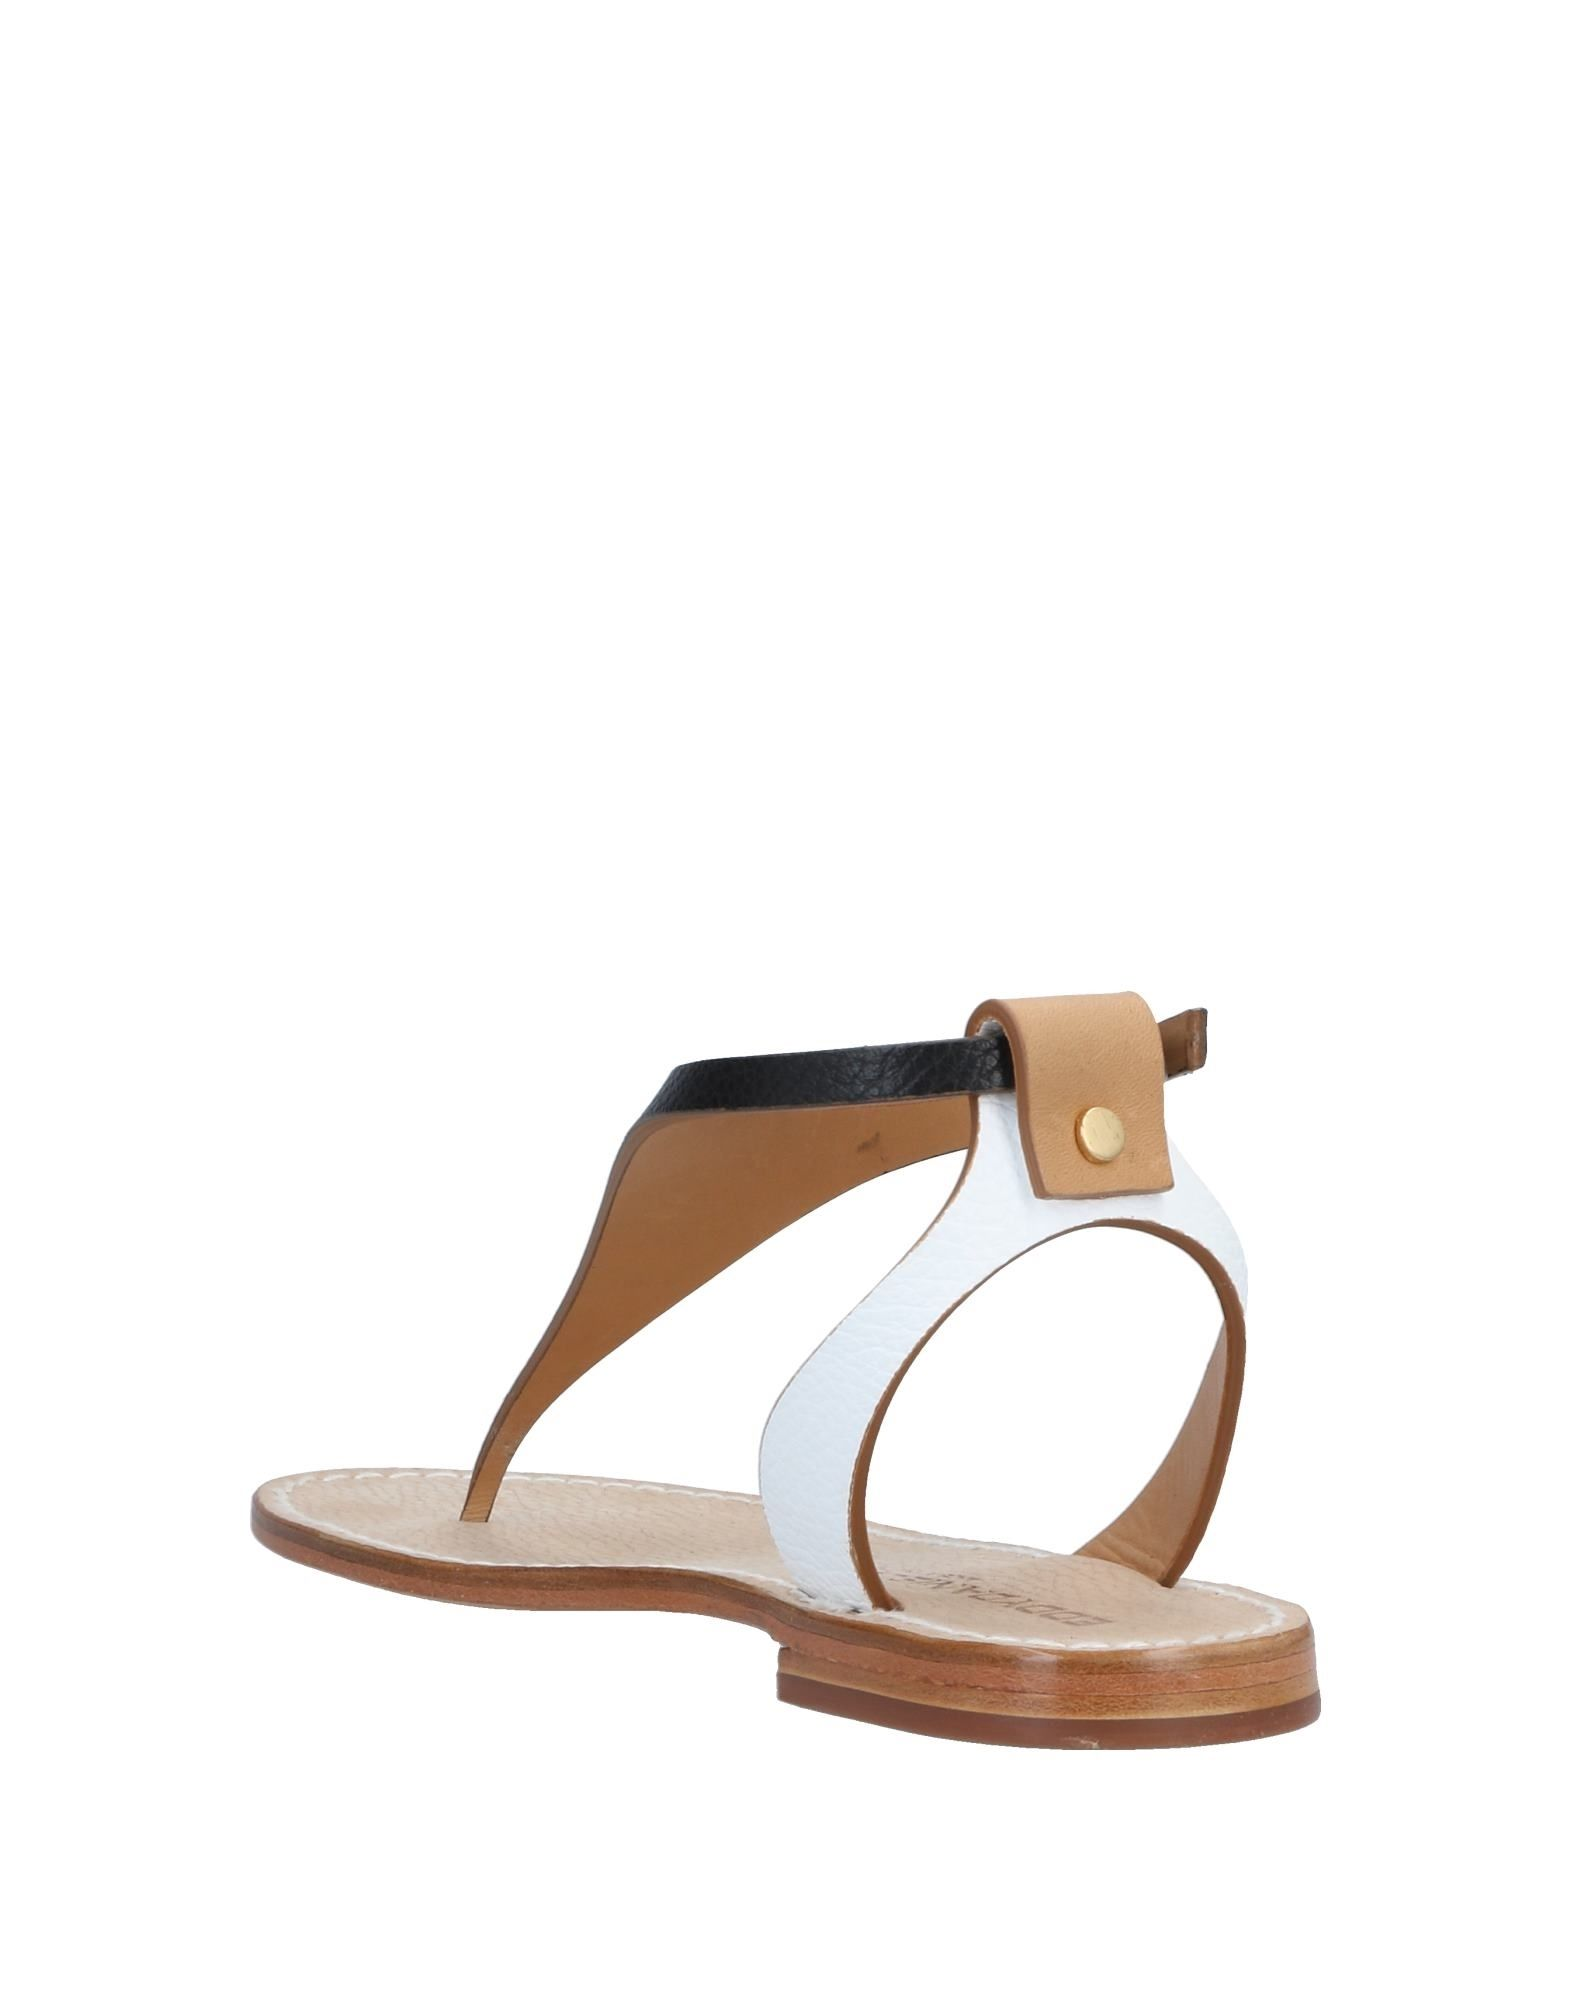 Eddy Daniele Dianetten Qualität Damen  11559991XQ Gute Qualität Dianetten beliebte Schuhe dc80a5